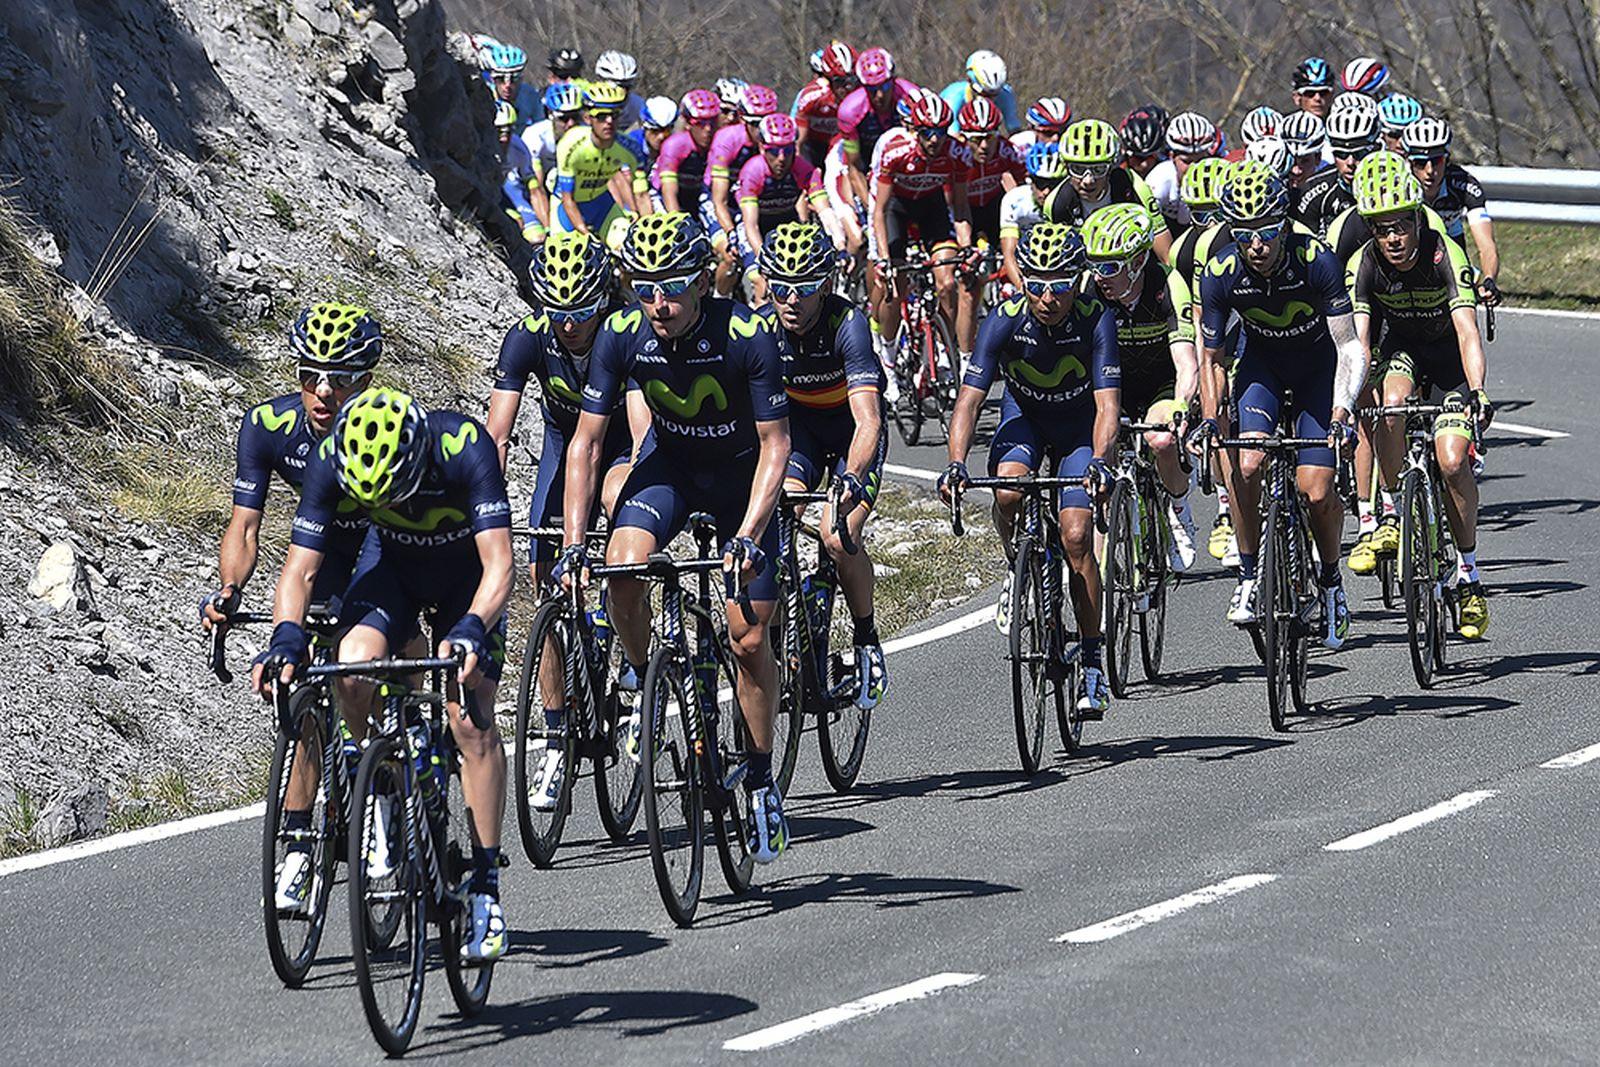 Cycling: 54th Vuelta Pais Vasco 2015/ Stage 2 Illustration Illustratie/ Peloton Peleton/ Landscape Paysage/ Team Movistar (Esp)/ Nairo QUINTANA (Col) Bilbao-Vitoria (175.4Km) Tour Ronde Baskenland/ Etape Rit/ (c)Tim De Waele